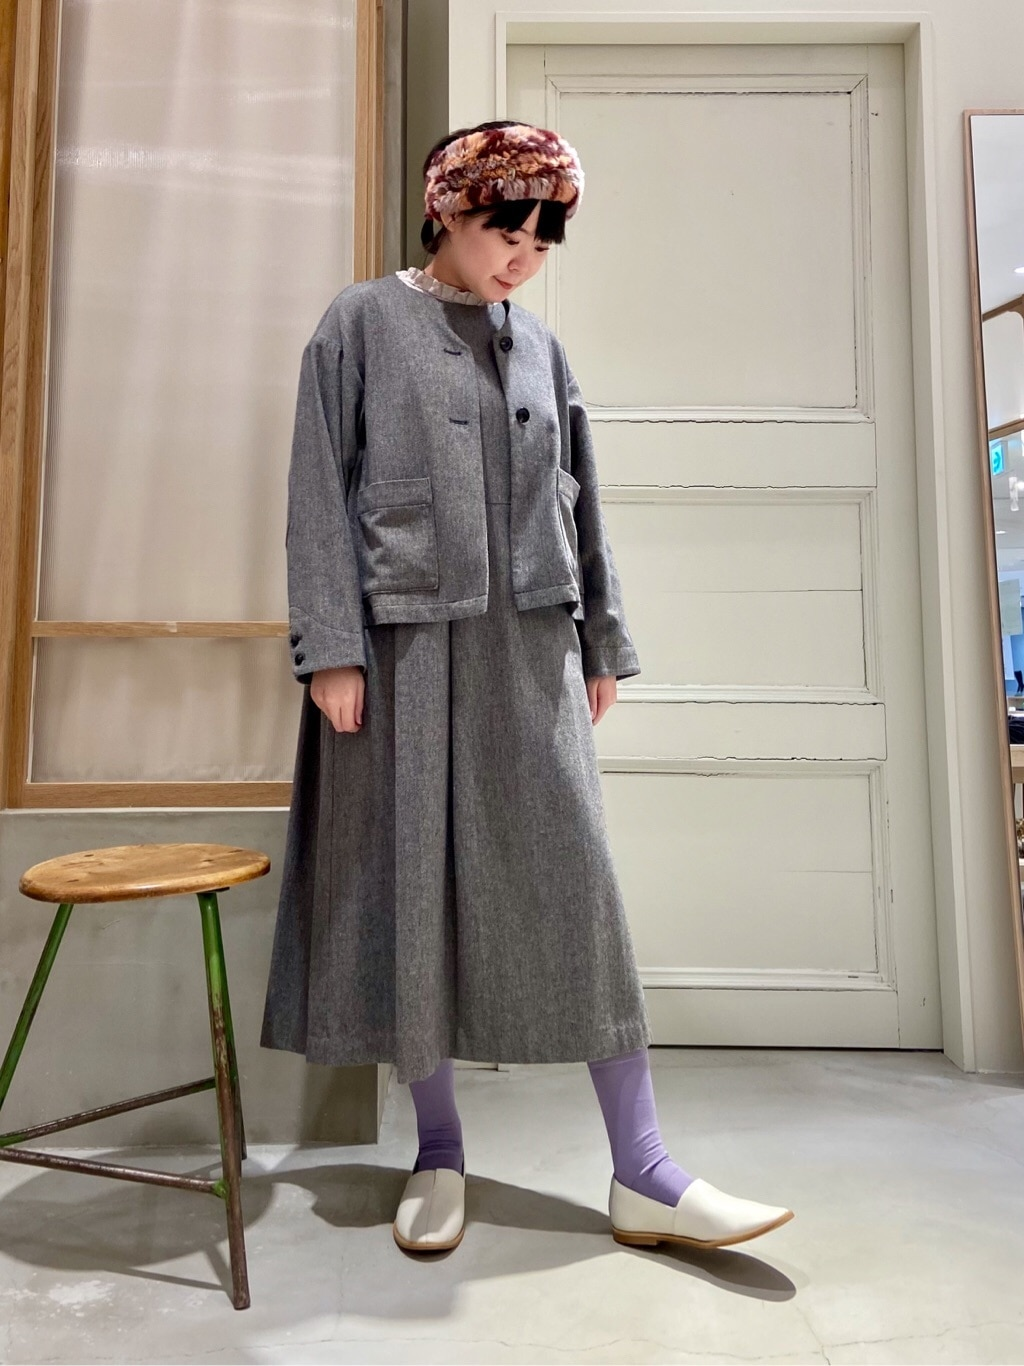 bulle de savon 渋谷スクランブルスクエア 身長:158cm 2020.10.30